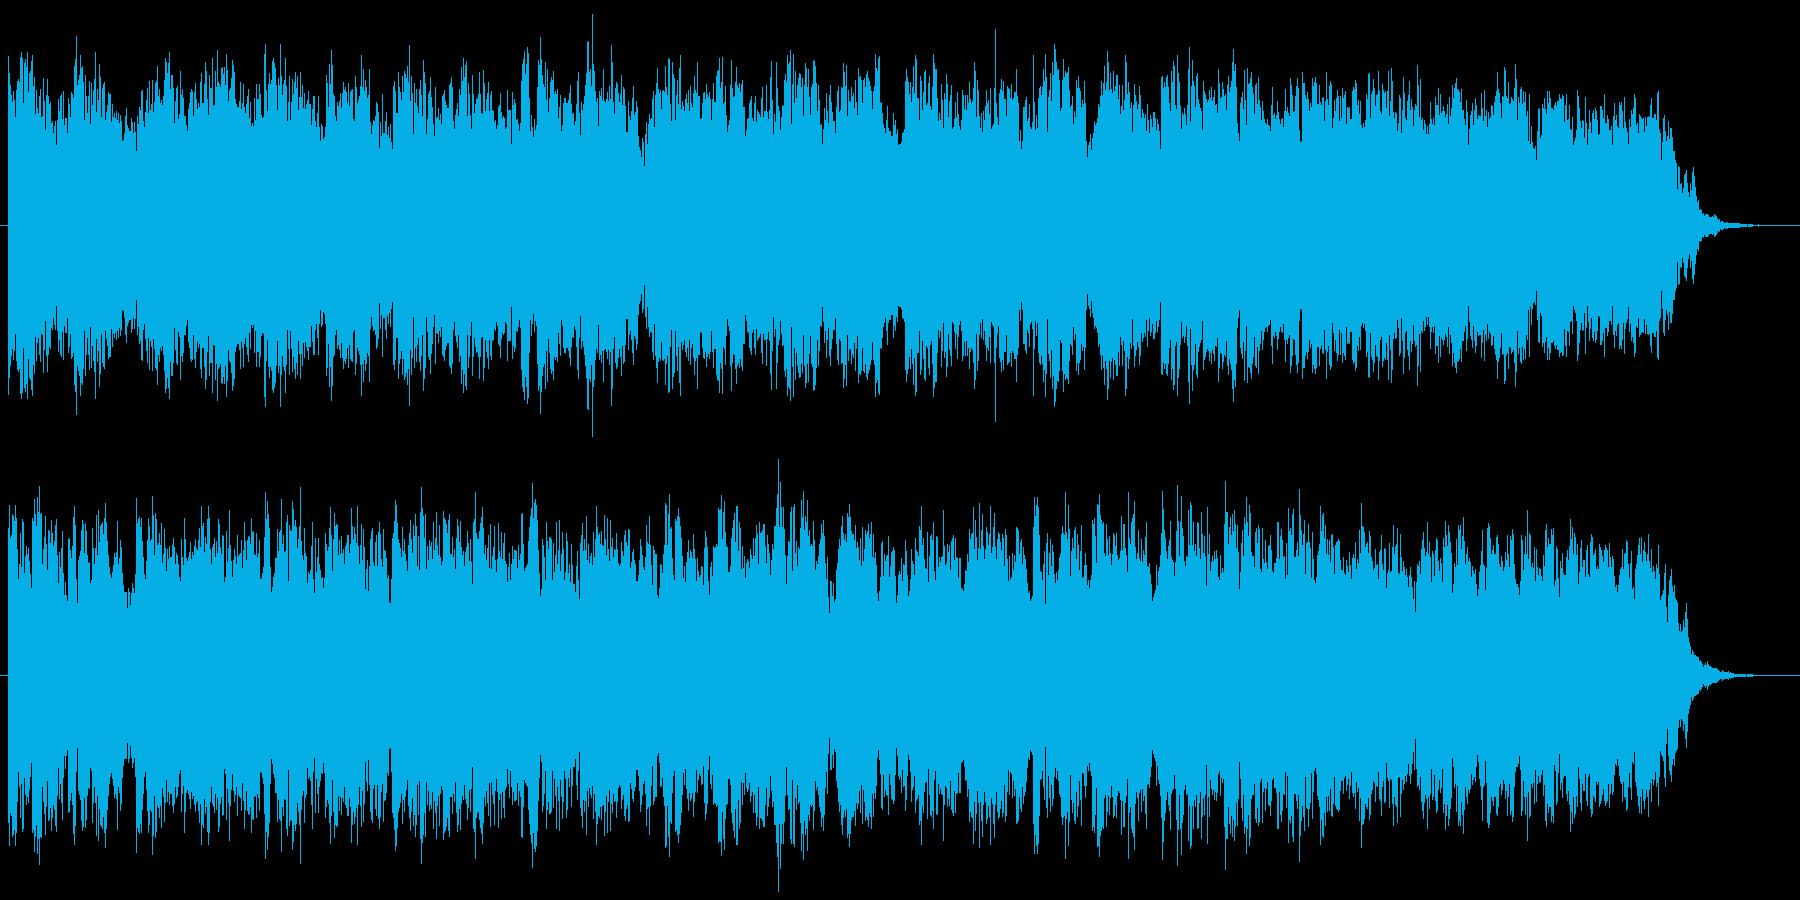 Eternal Japanese Koto&Shakuhachiの再生済みの波形